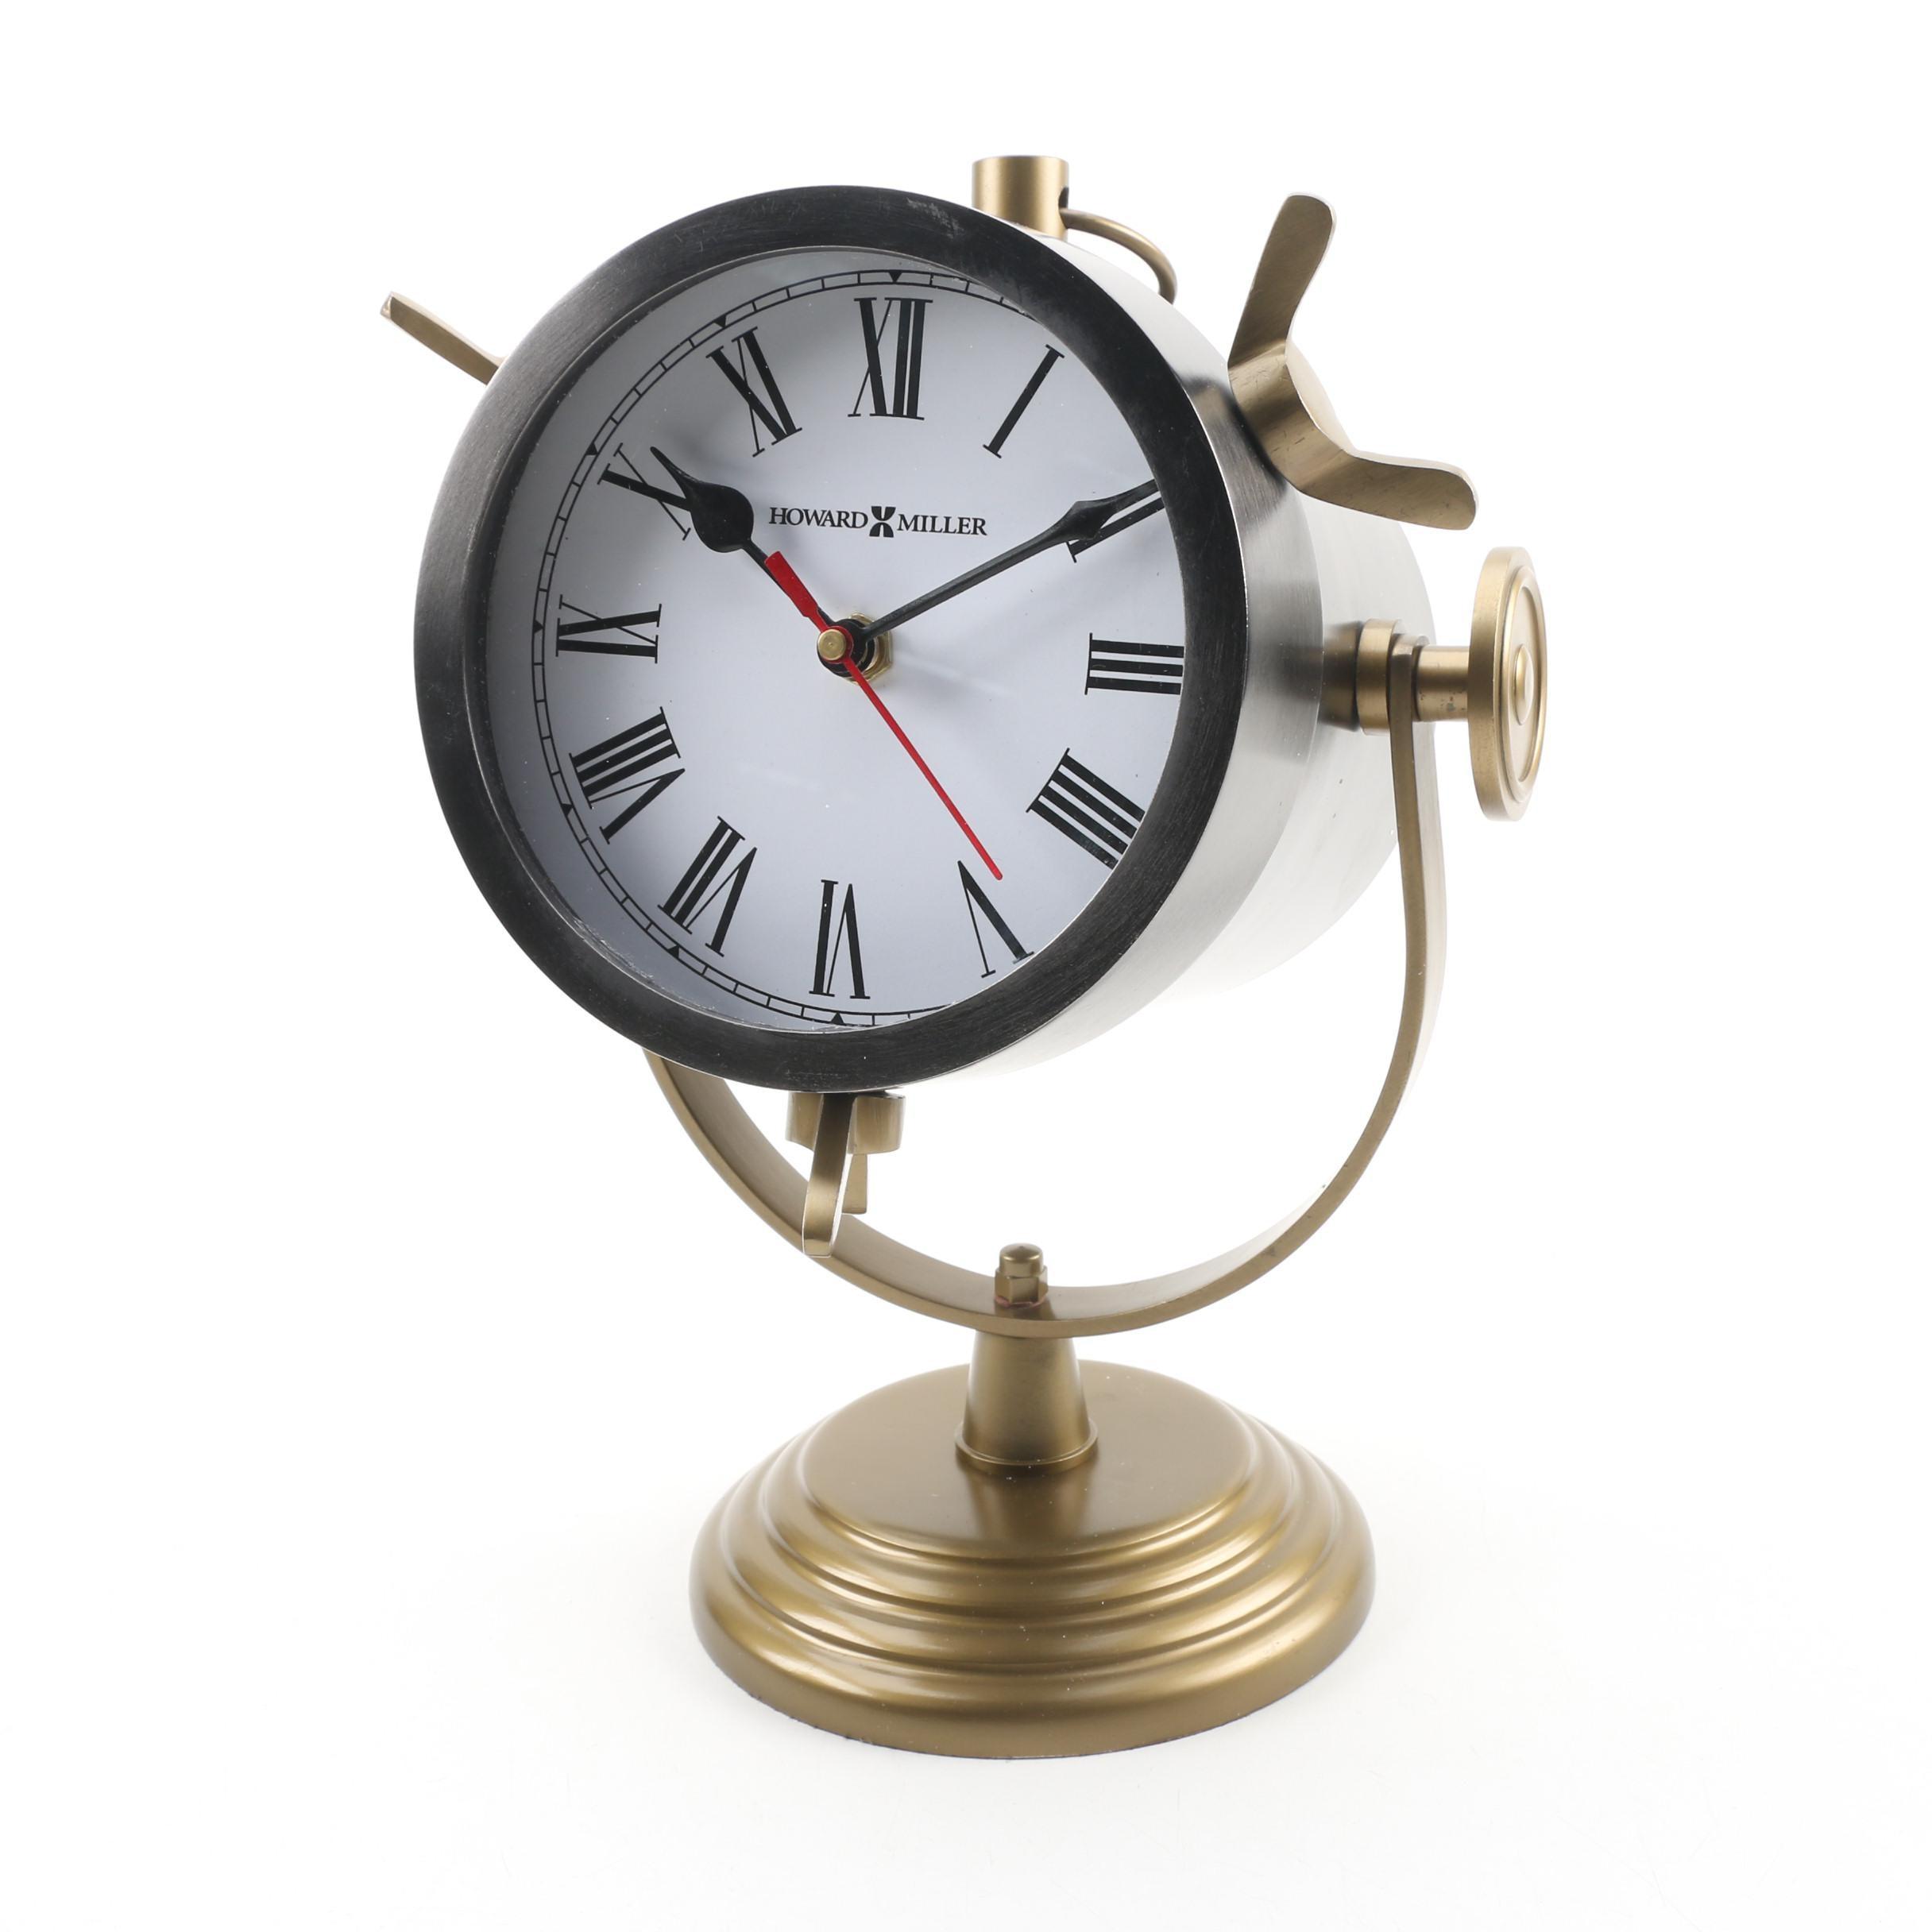 Howard Miller Vintage Spotlight Style Quartz Mantel Clock with Antiqued Finish